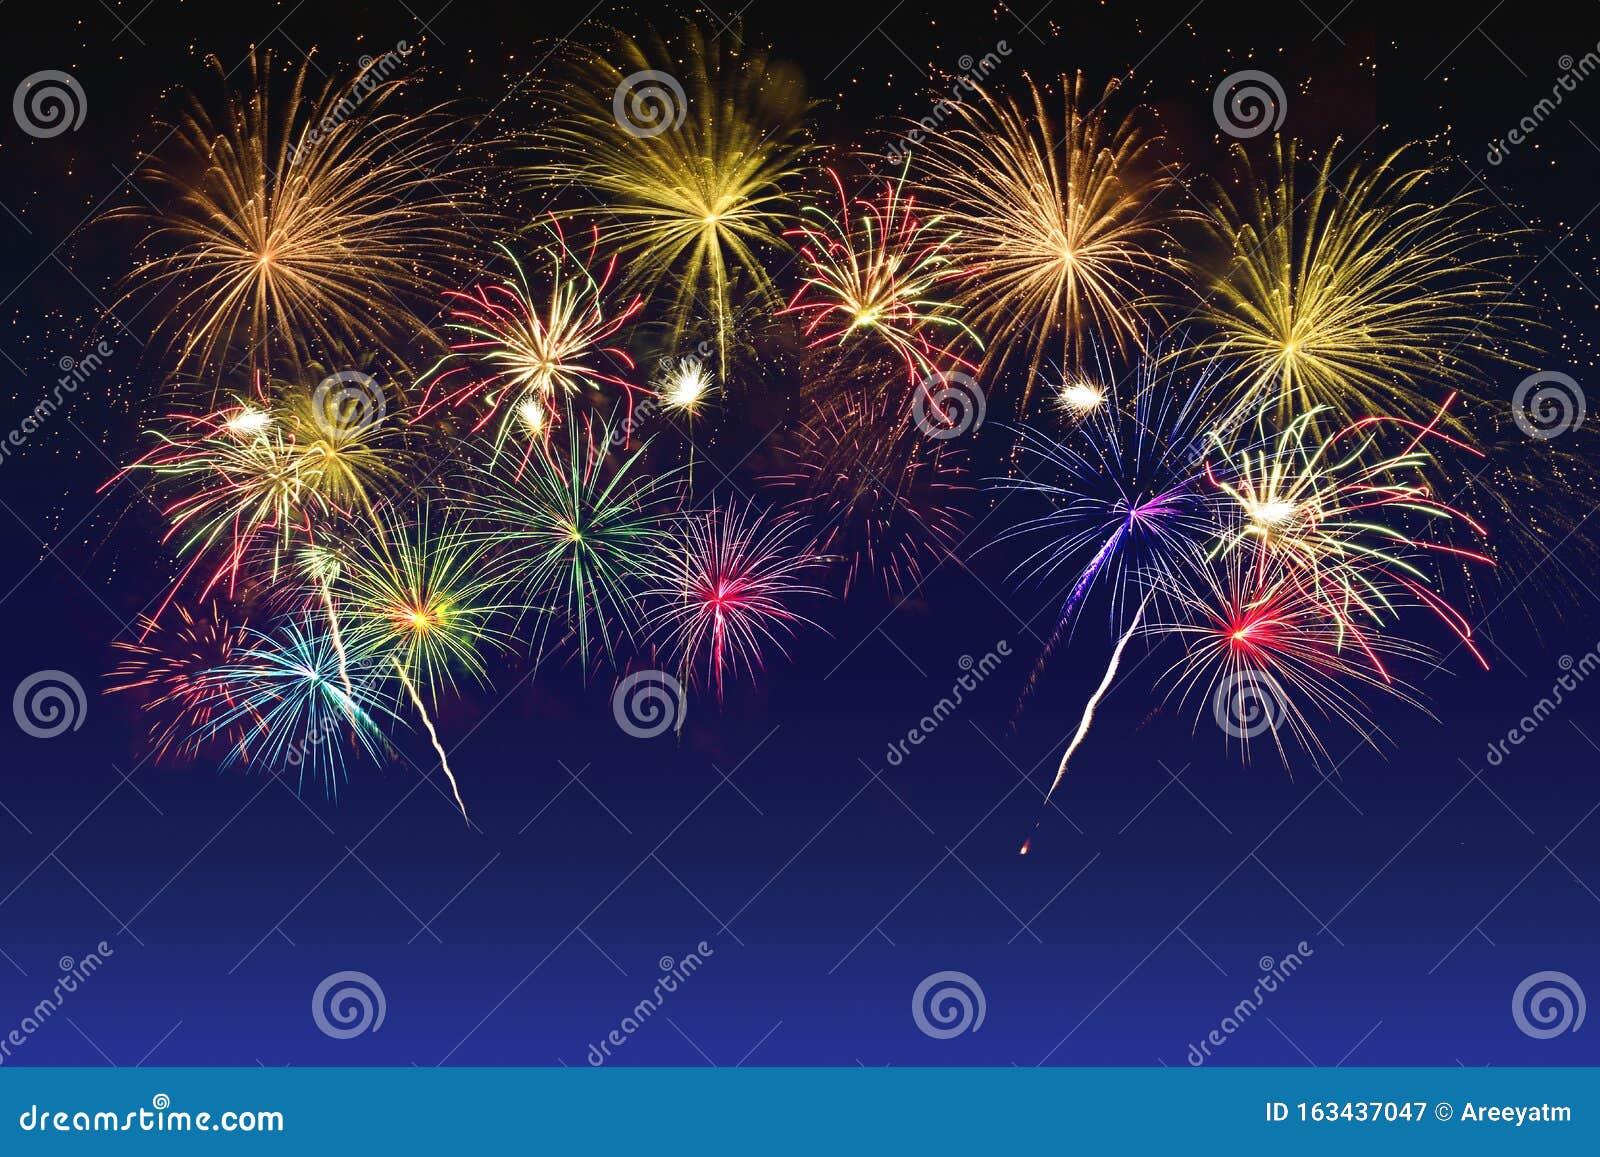 Colorful fireworks celebration on twilight sky